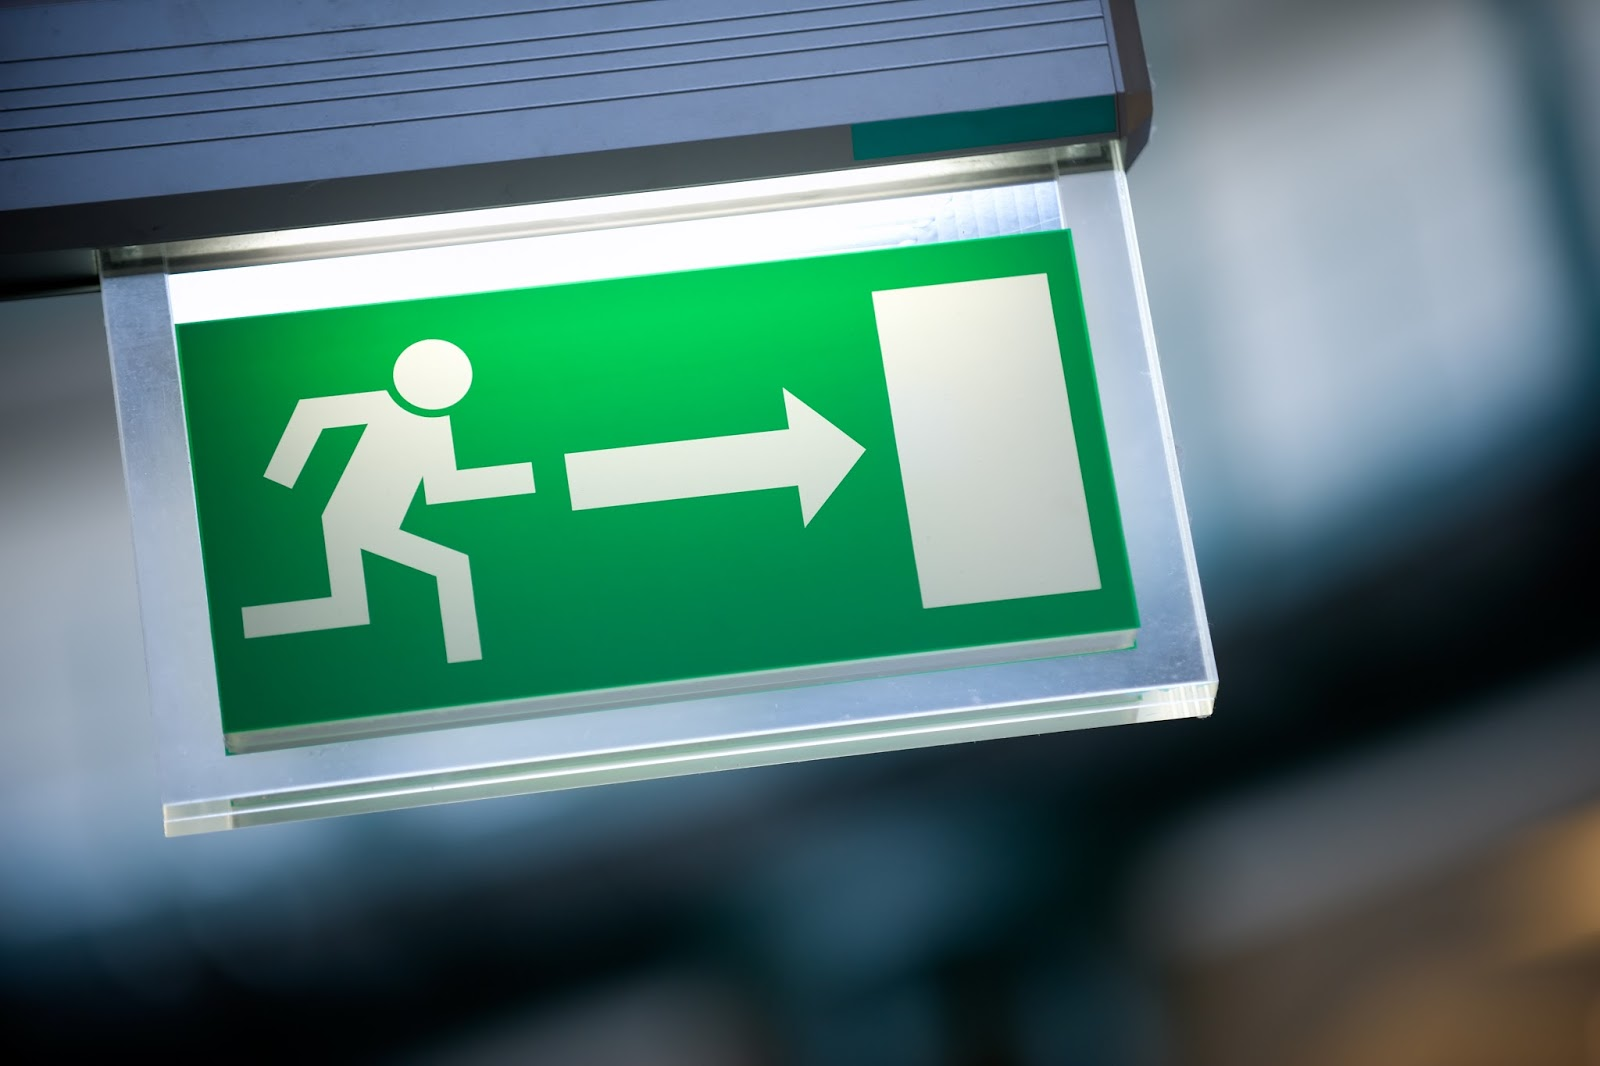 Exit Sign Standard